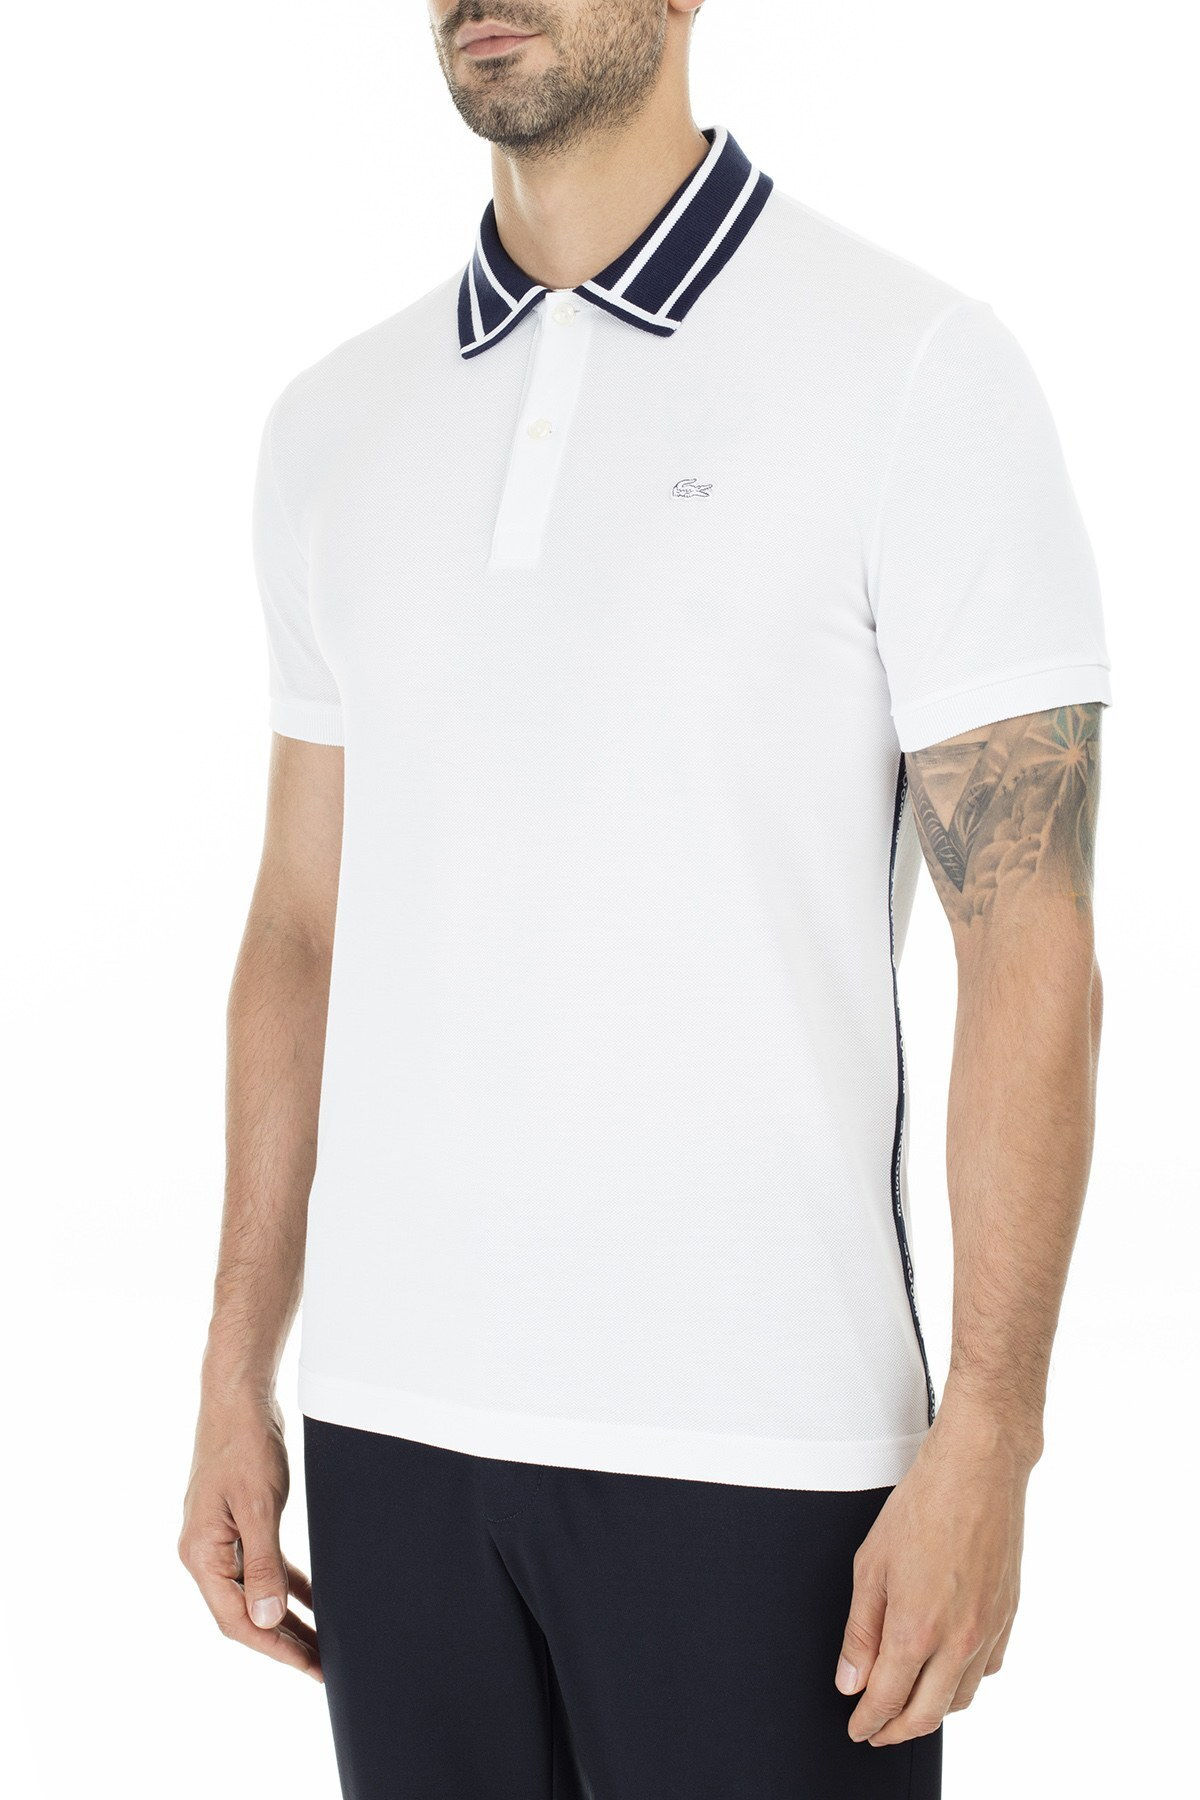 Lacoste % 100 Pamuk Slim Fit T Shirt Erkek Polo PH0008 08A BEYAZ